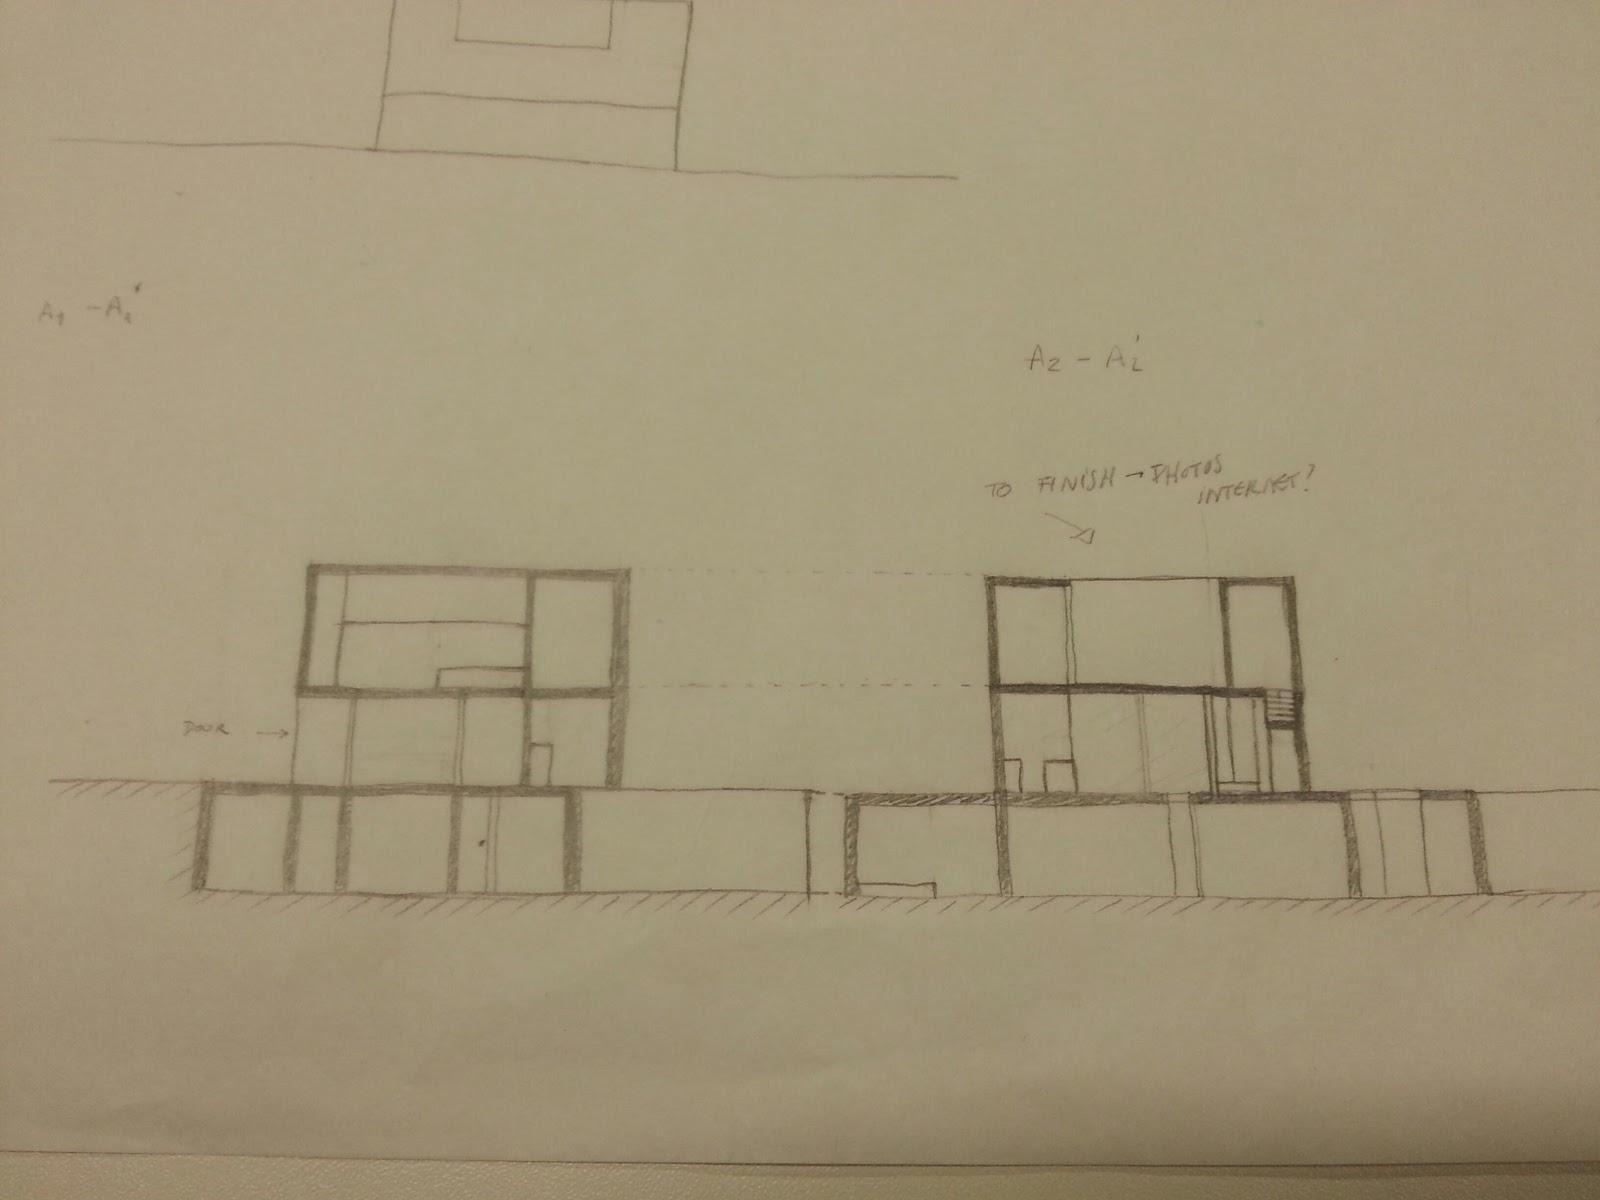 Lucas chung leiria house by aires mateus architects for House in leiria aires mateus